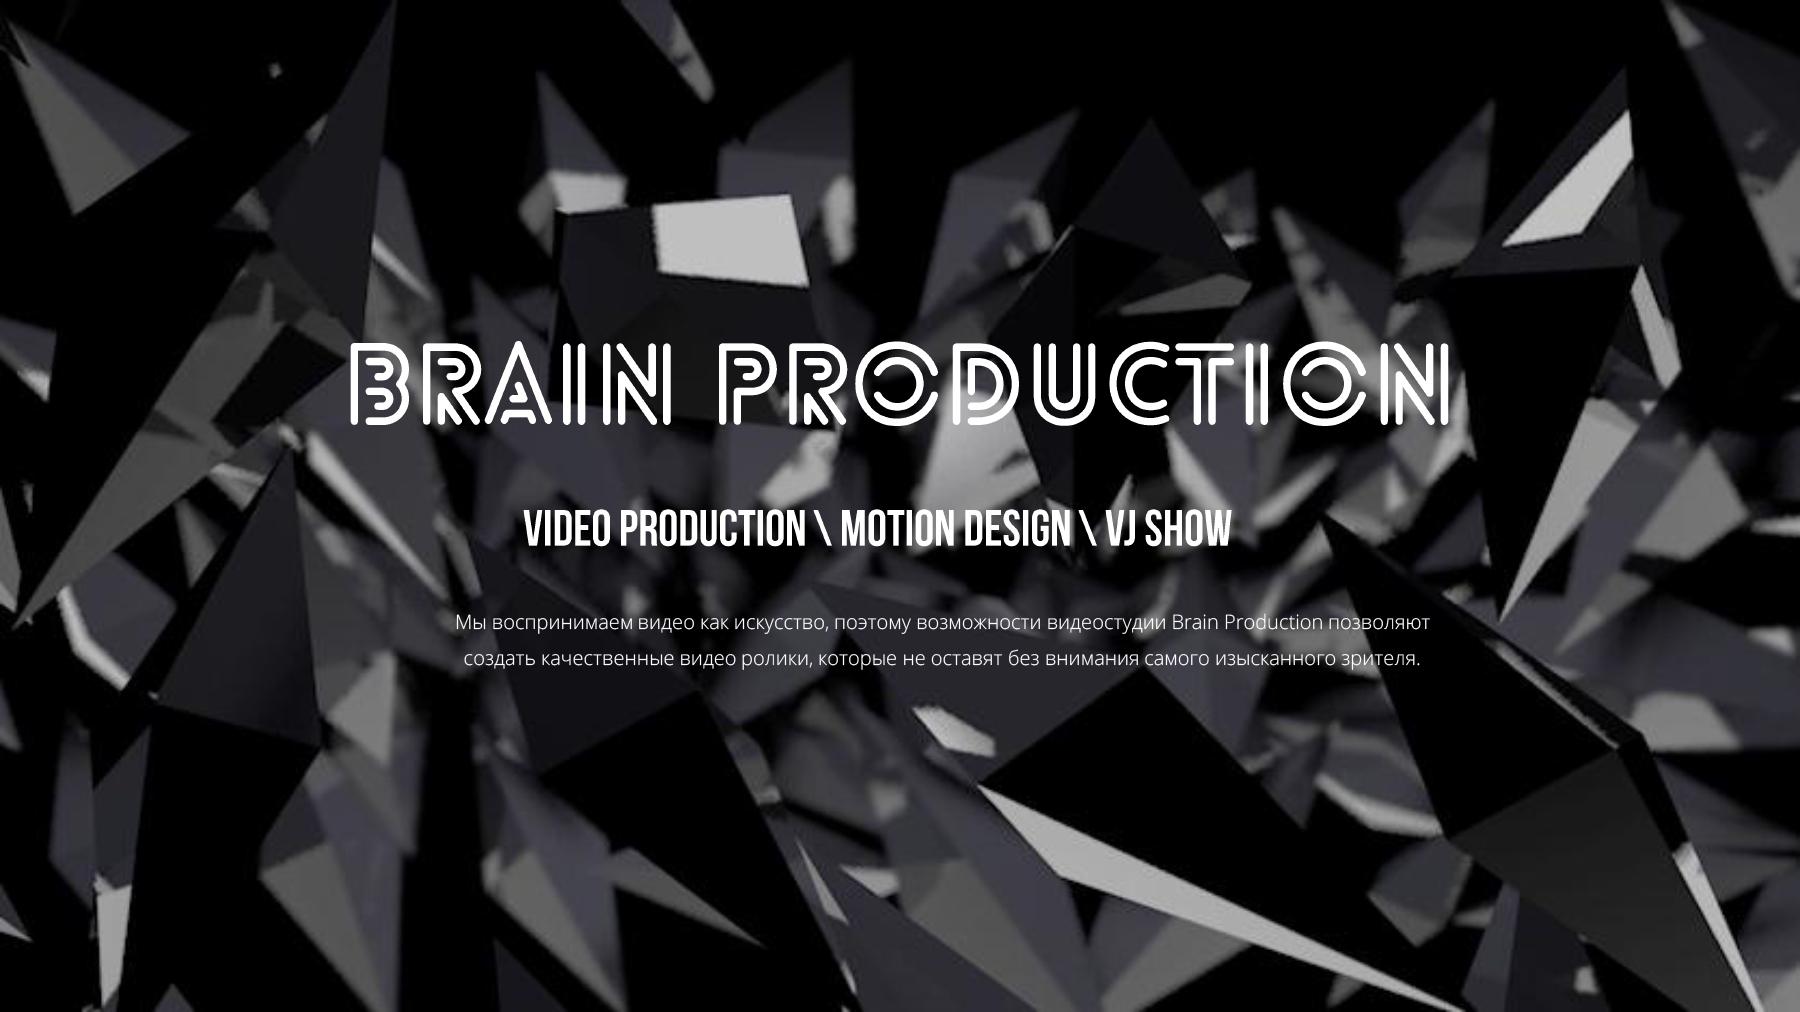 BRAIN_VIDEO_PRODUCTION_motion_design_vj_show